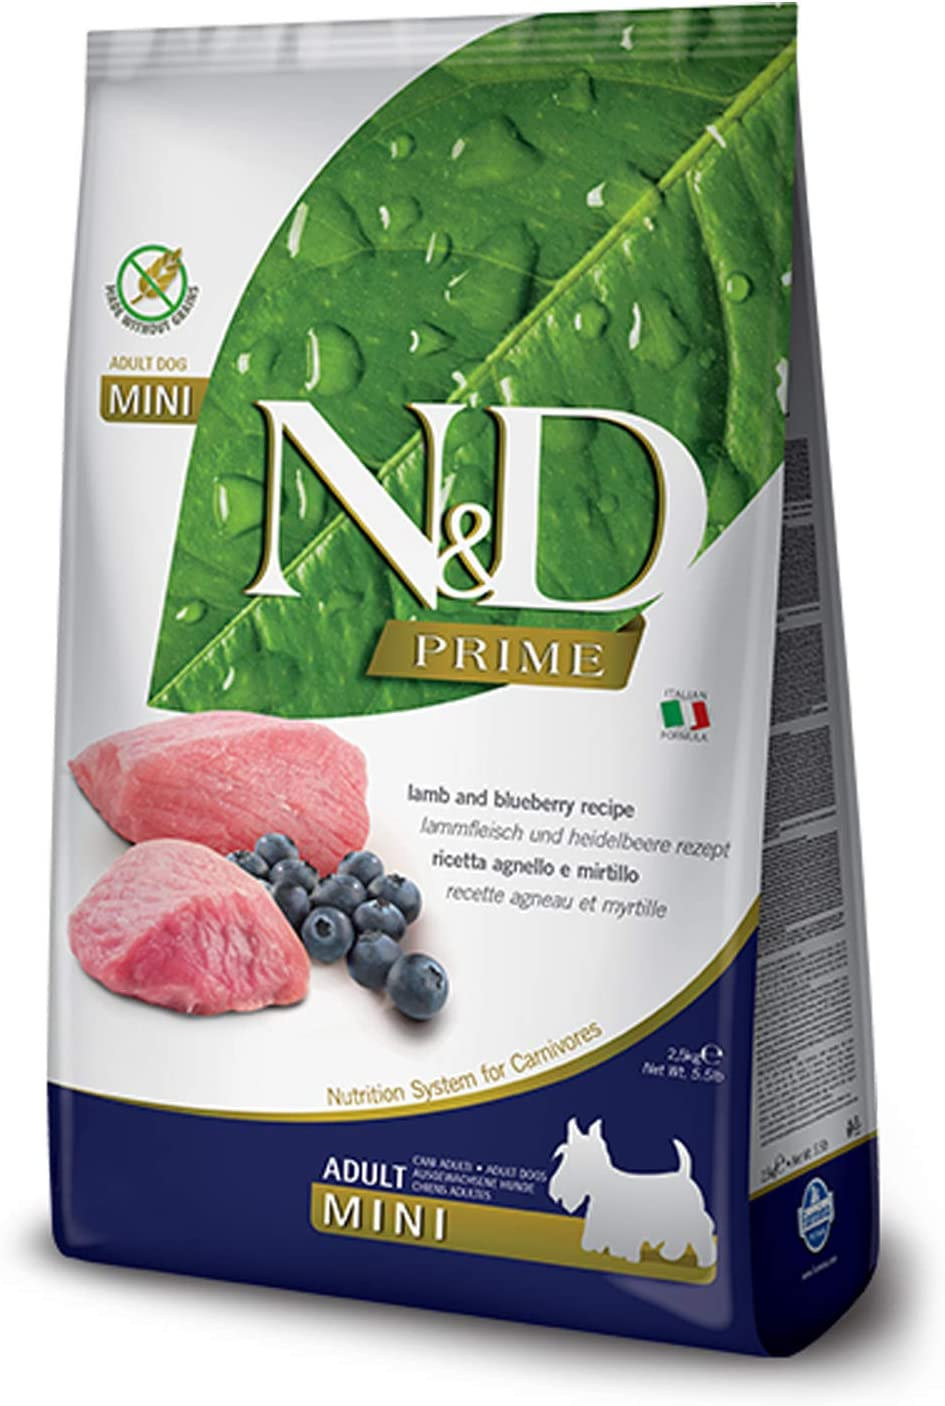 Farmina Natural And Delicious Grain-Free Formula Dry Dog Food, 5.5-Pound, Lamb